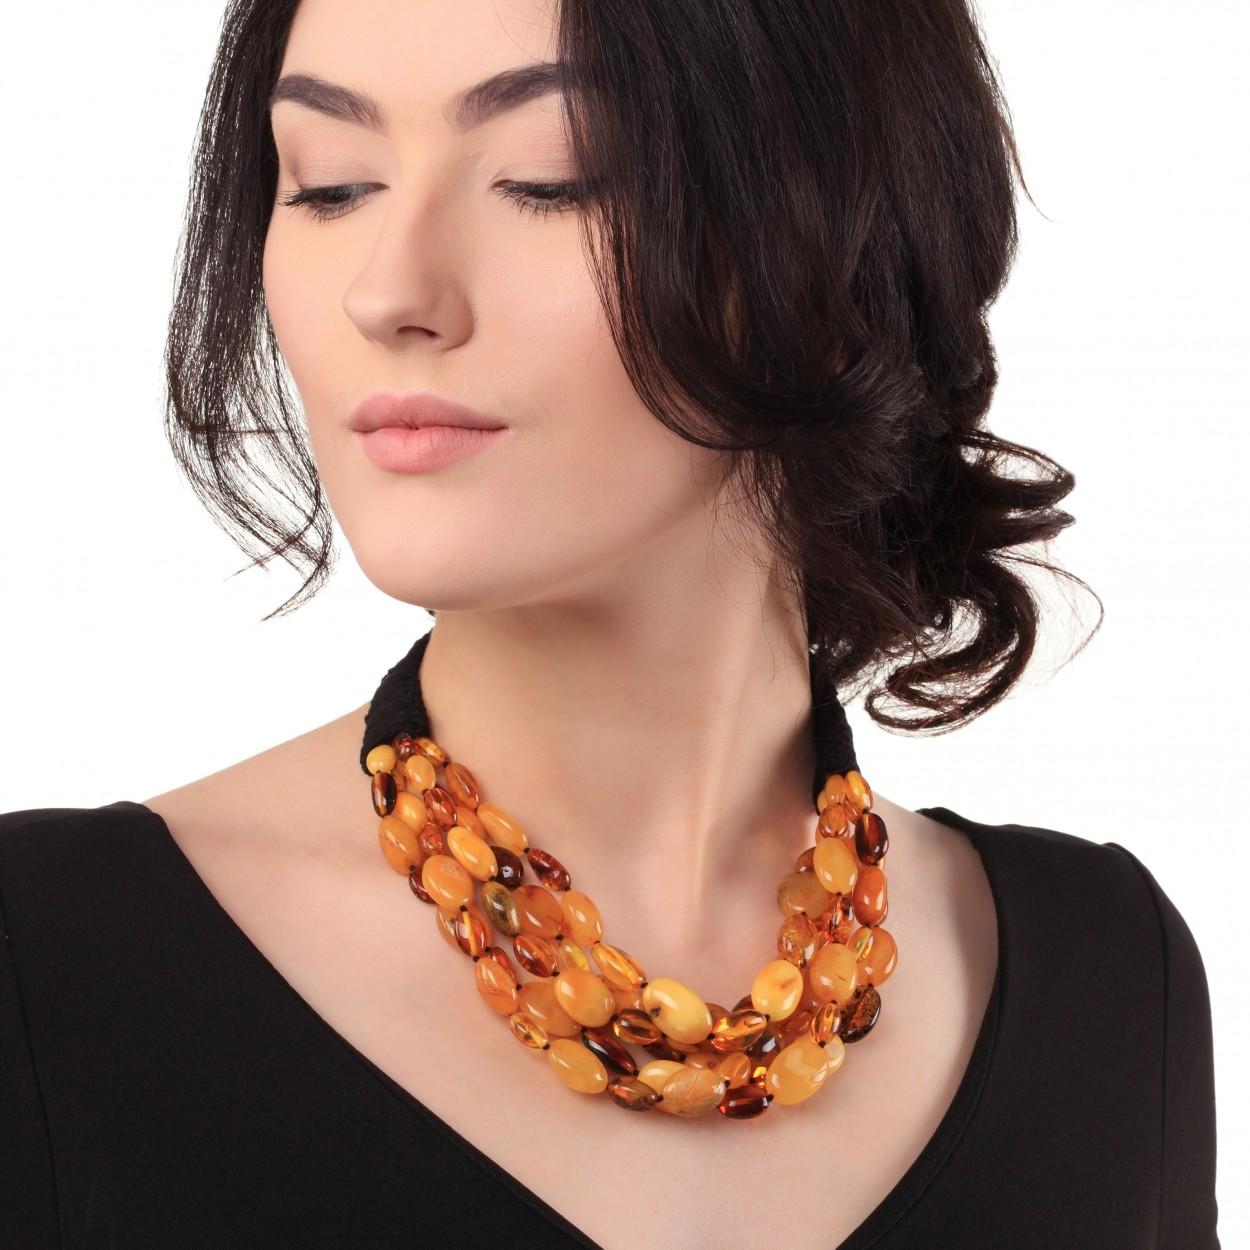 Autumn Beans Amber Necklace